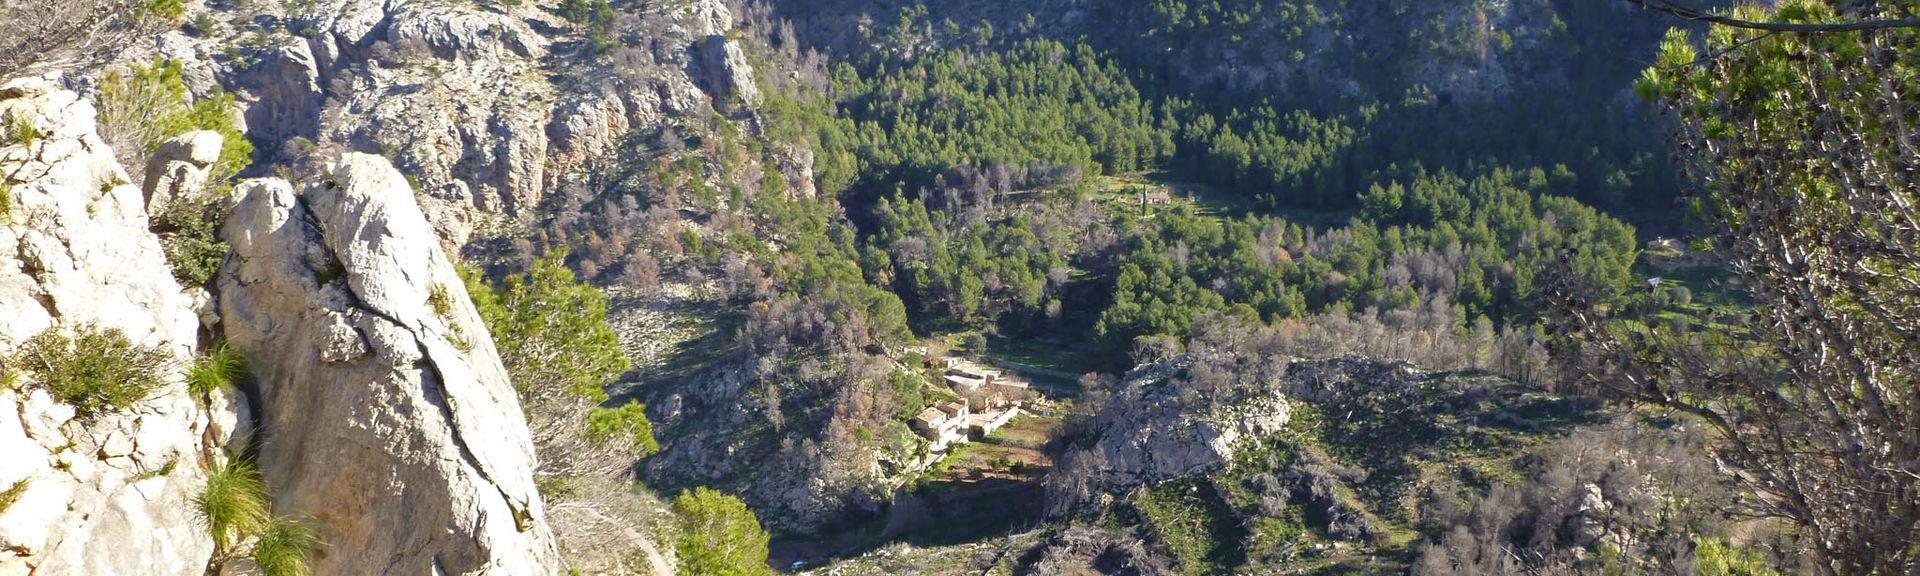 El Toro, Isole Baleari, Spagna